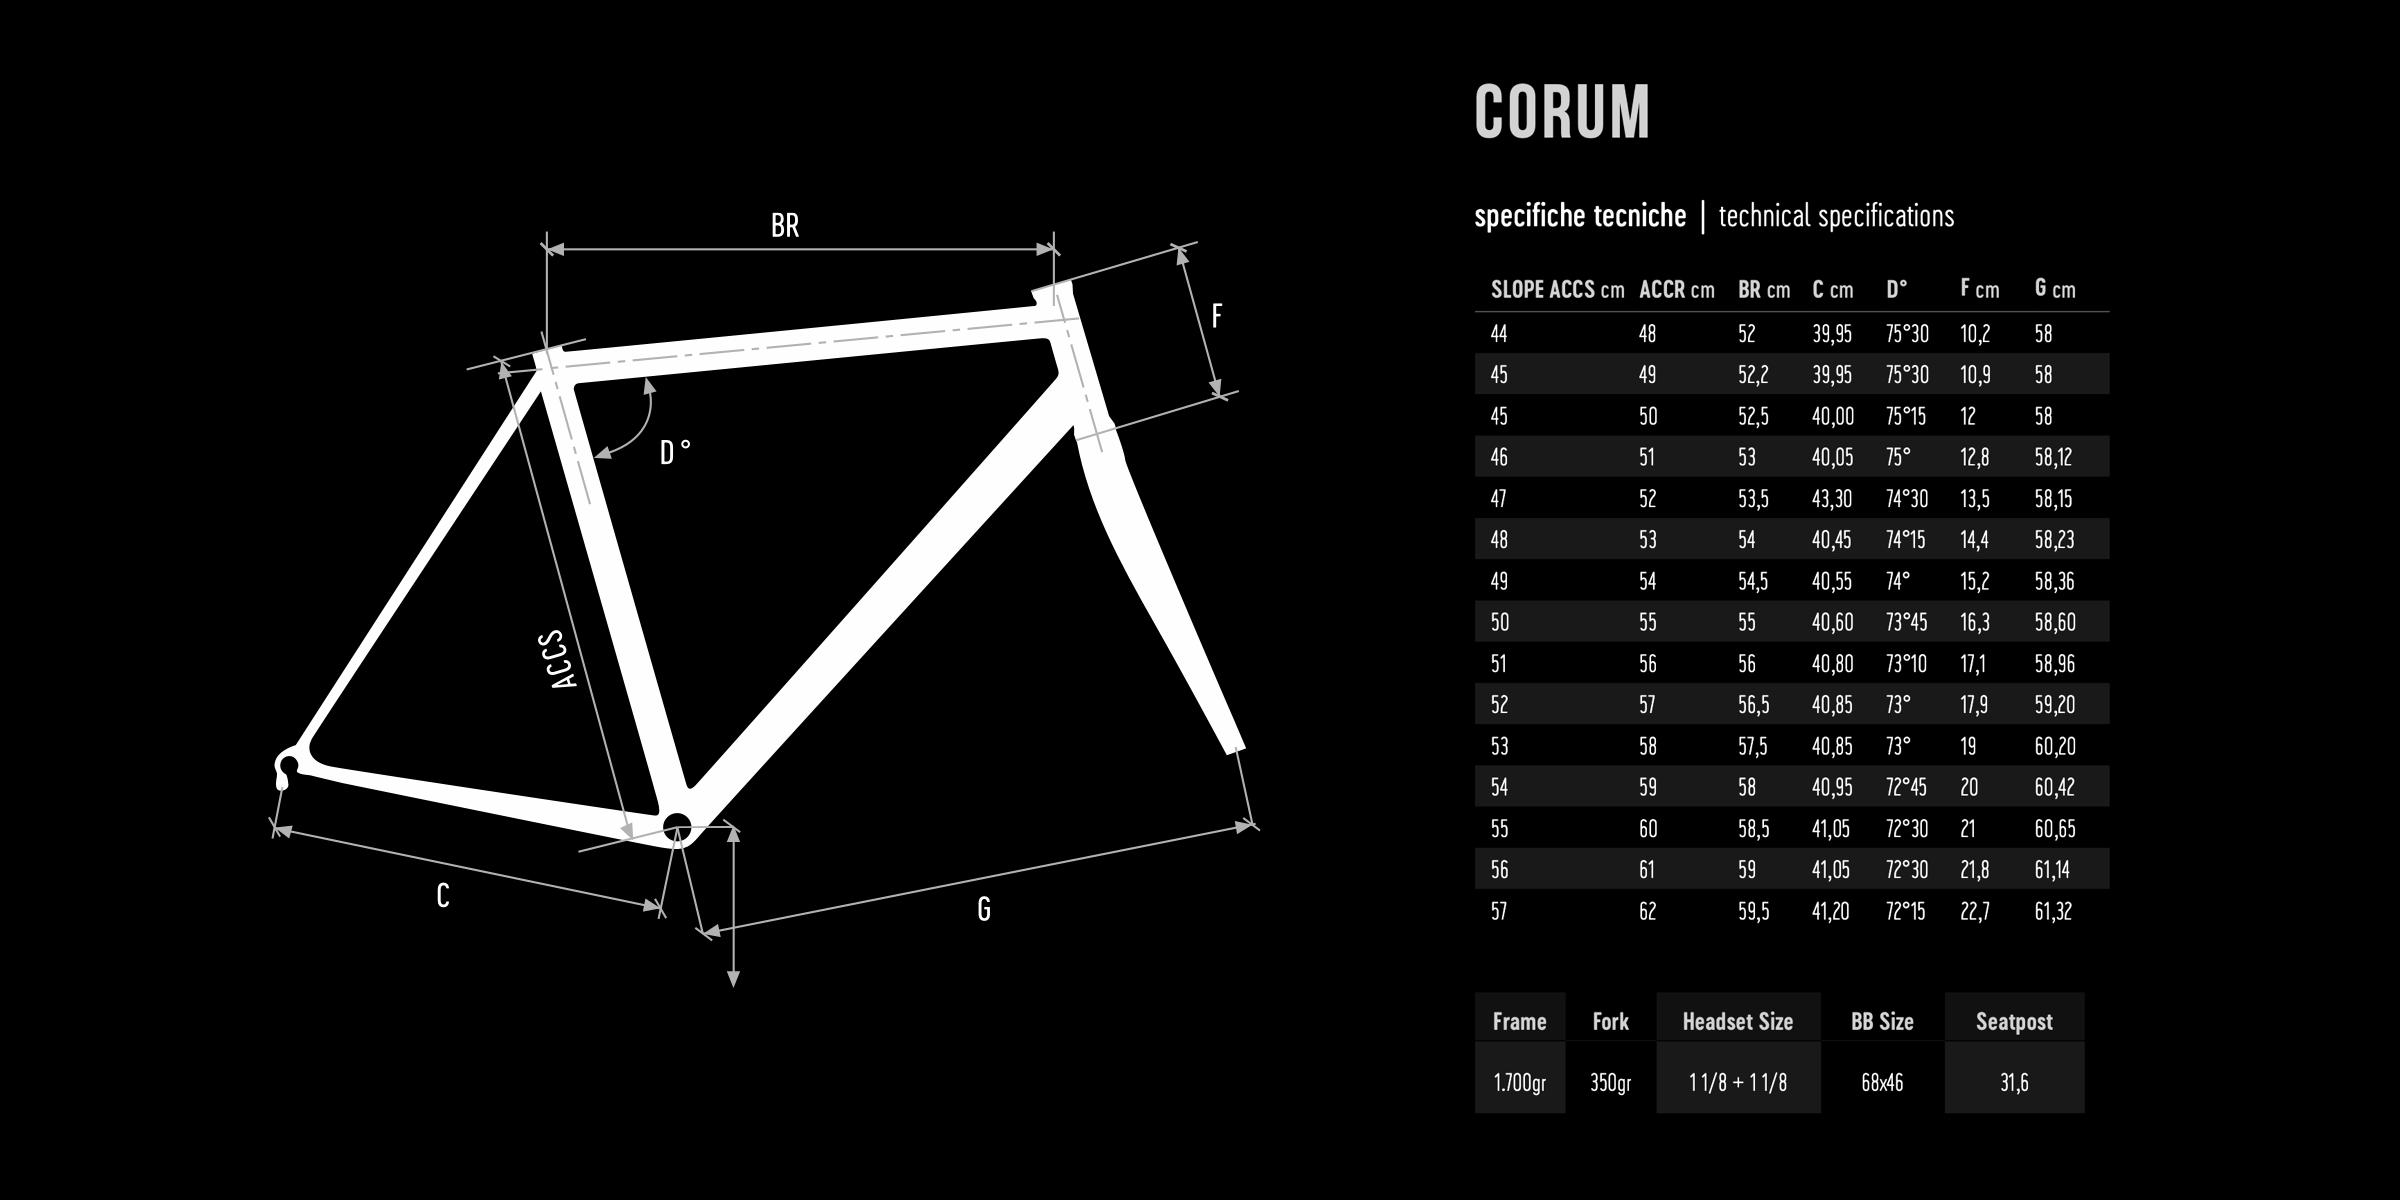 De Rosa geometry CORUM 2021